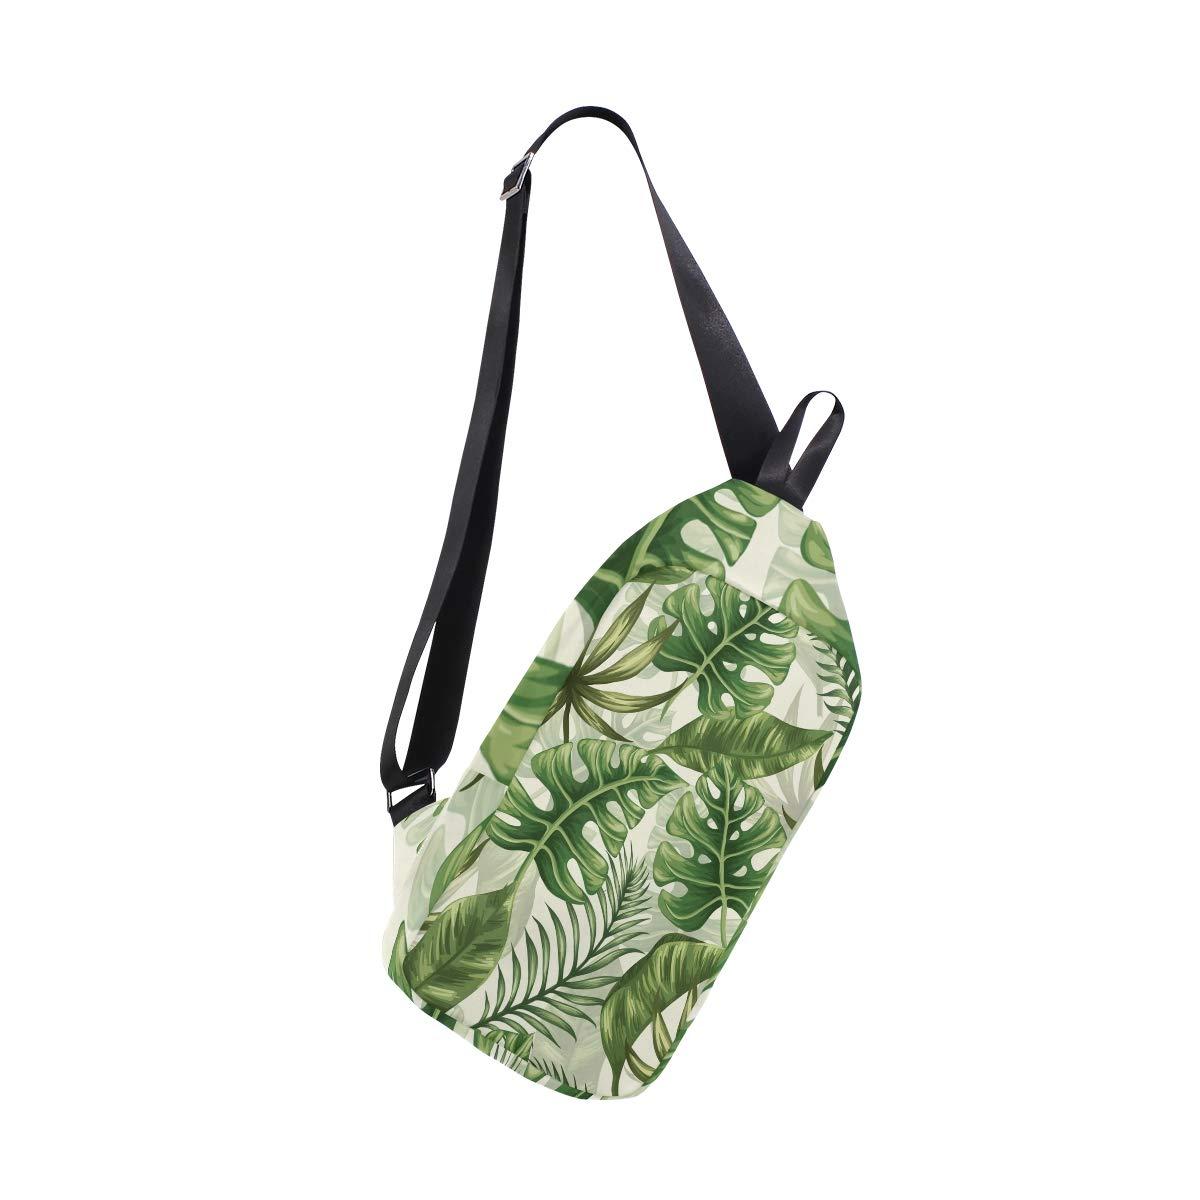 AHOMY Watercolor Tropical Leaf Messenger Bag Small Travel School Sling Bag Crossbody Bag